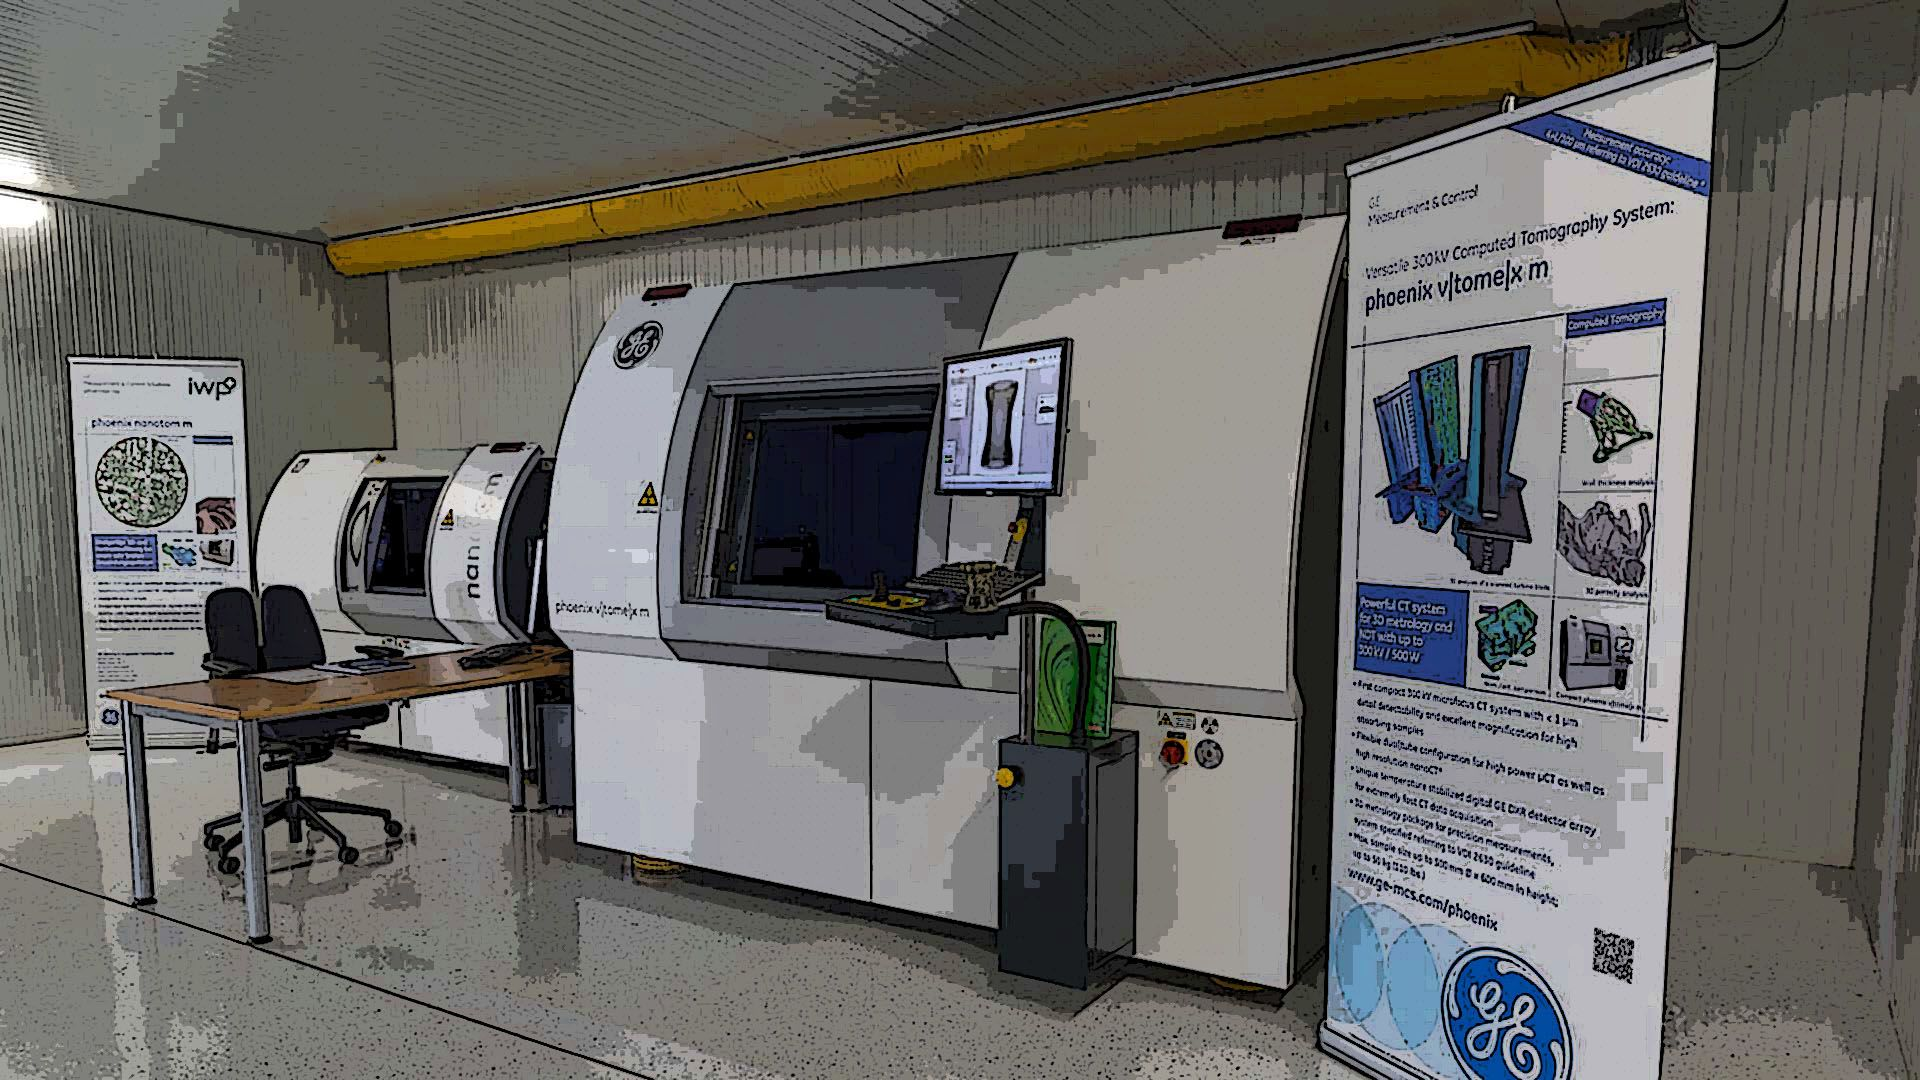 Computertomographie - Überblick - CT